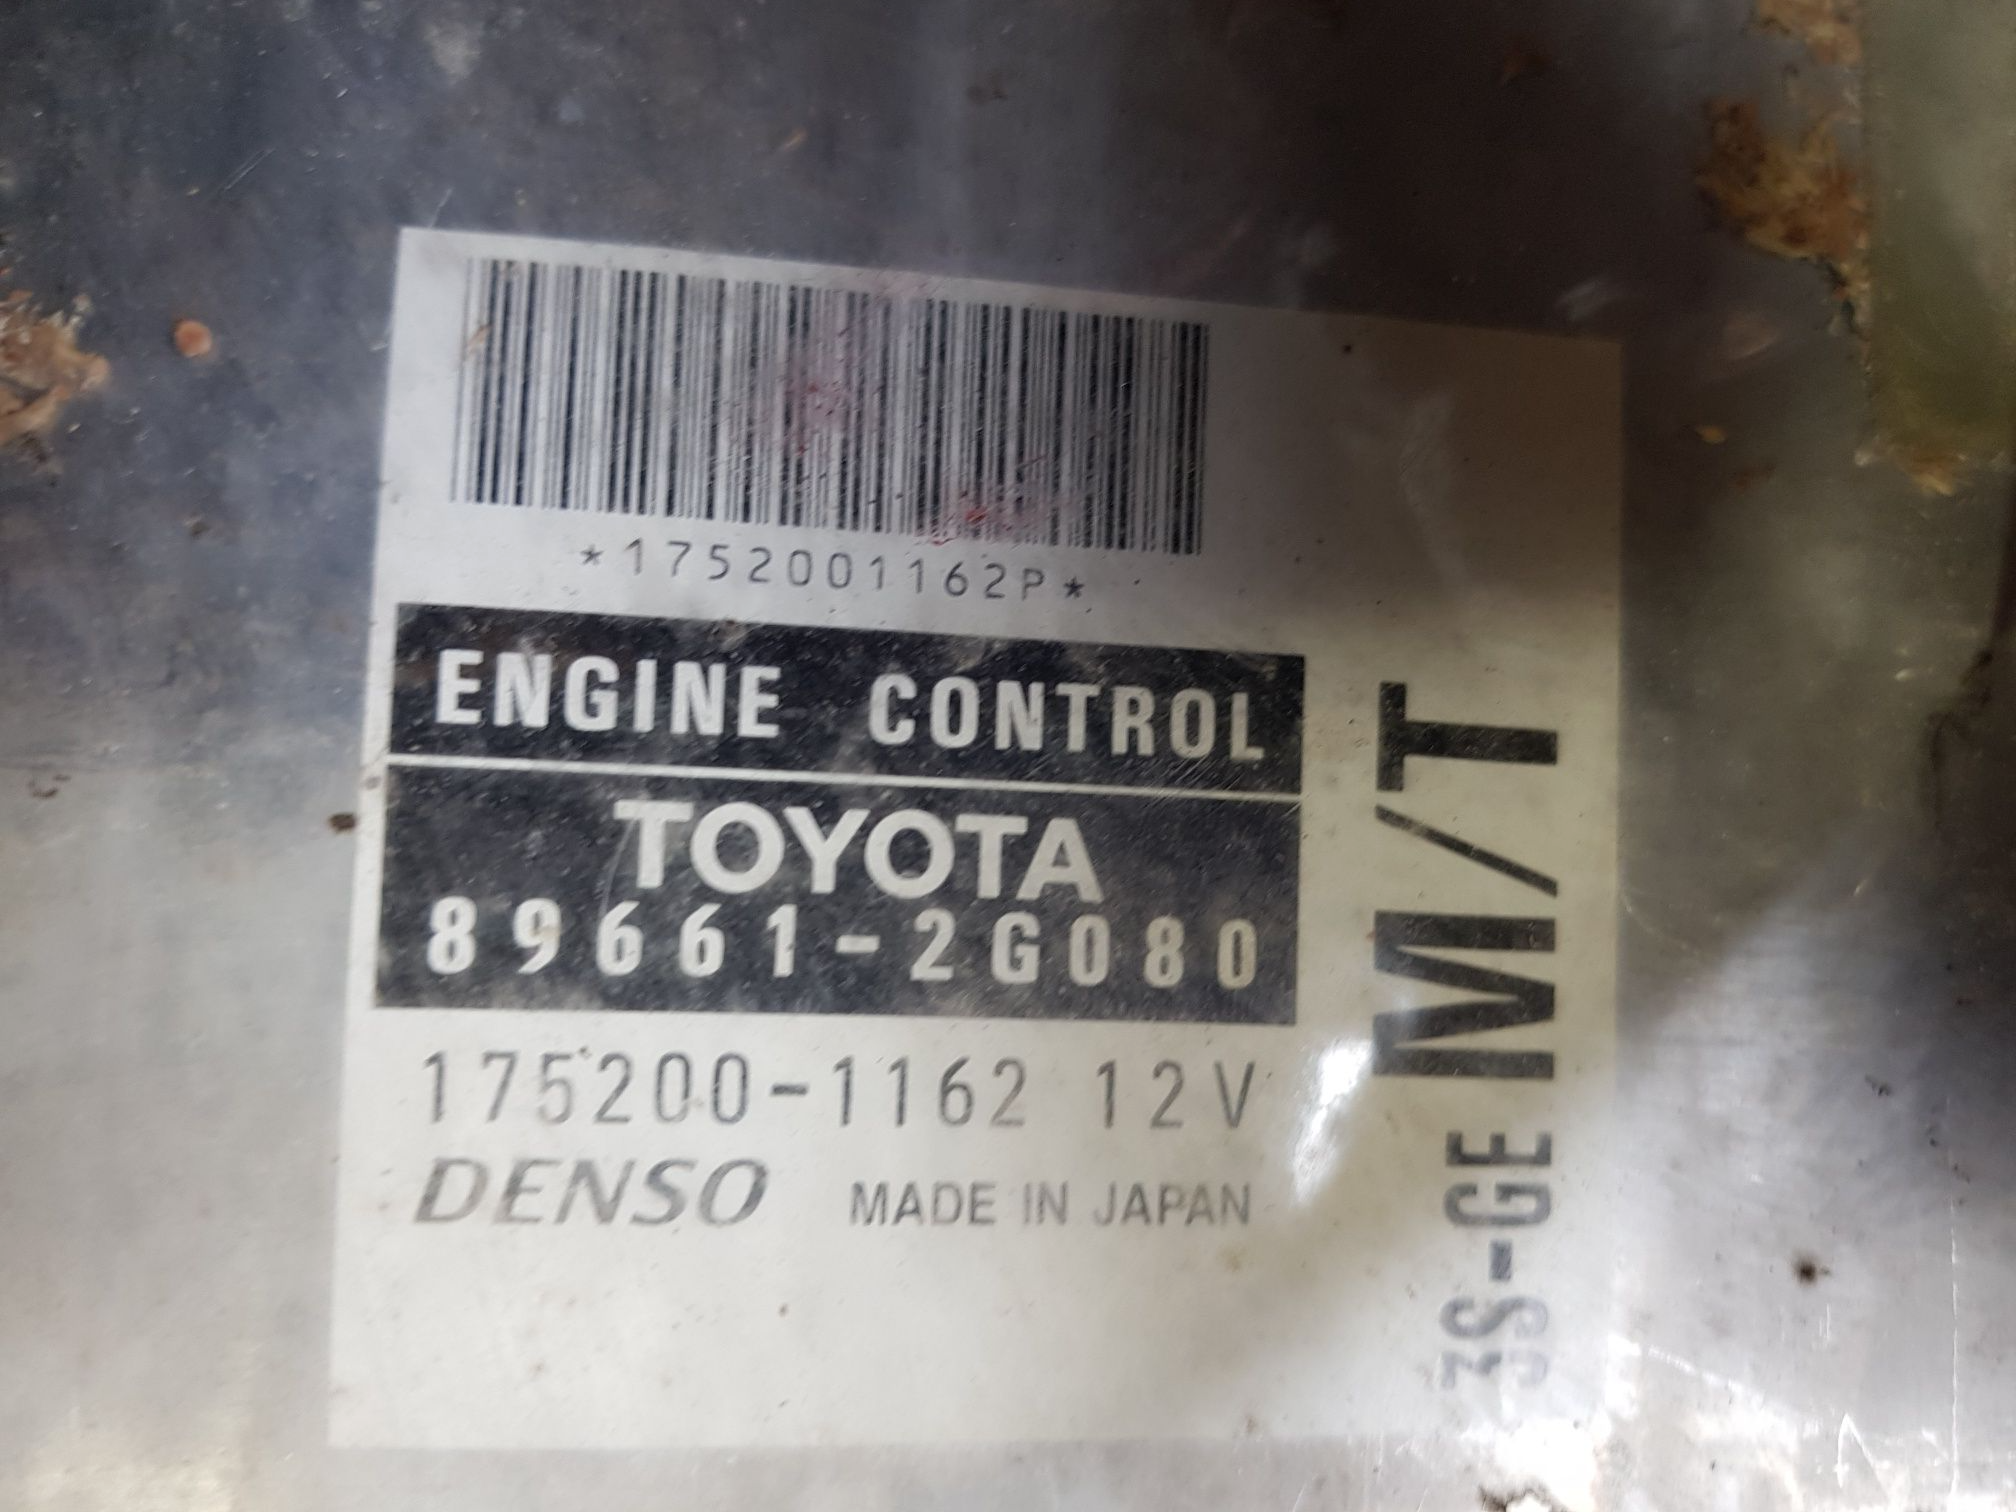 Toyota Celica St202 3sge Vvt I Beams Engine Kit 1993 1999 Mazda Rx 7 Wiring Harness